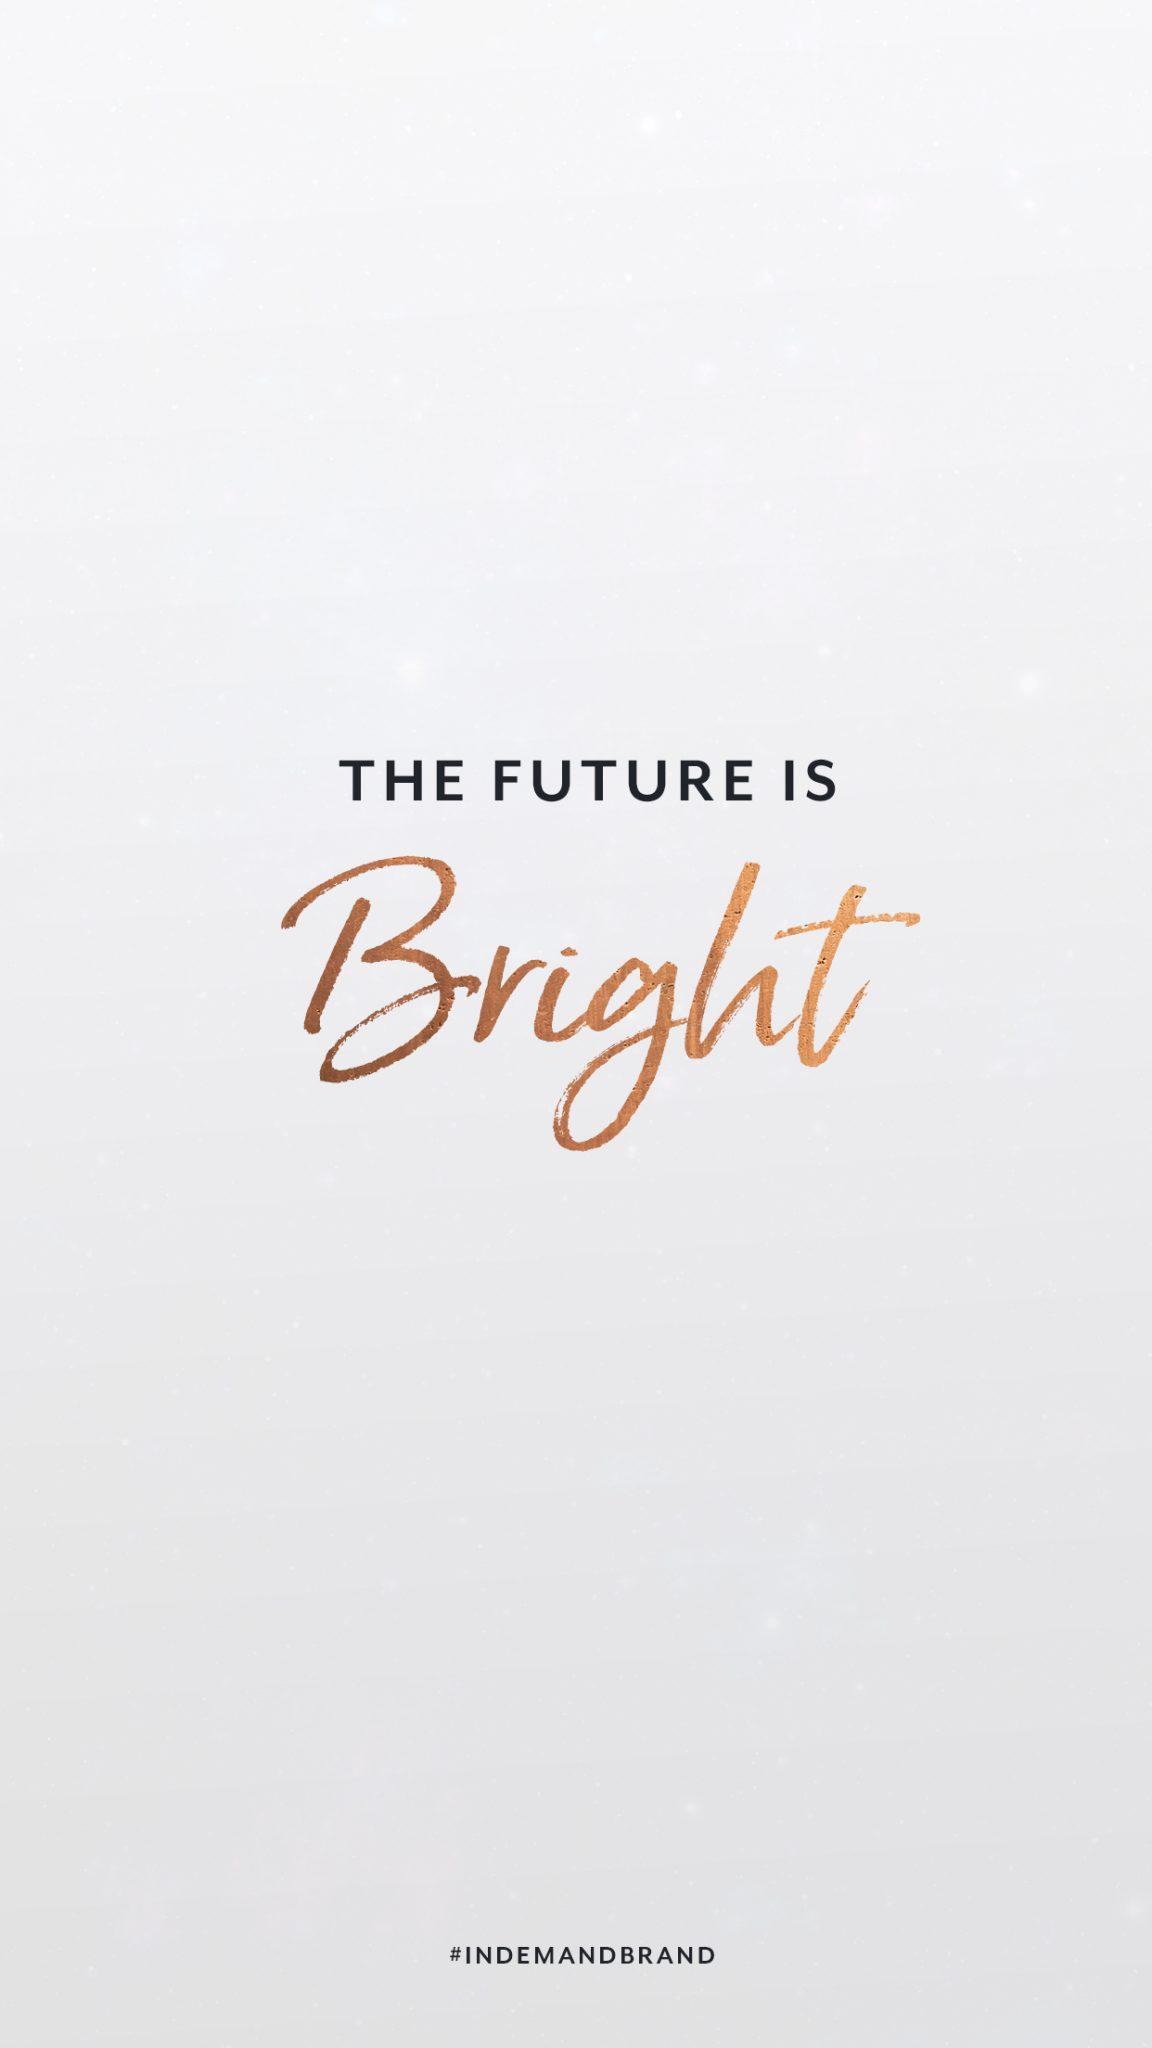 The future is bright. #InDemandBrand